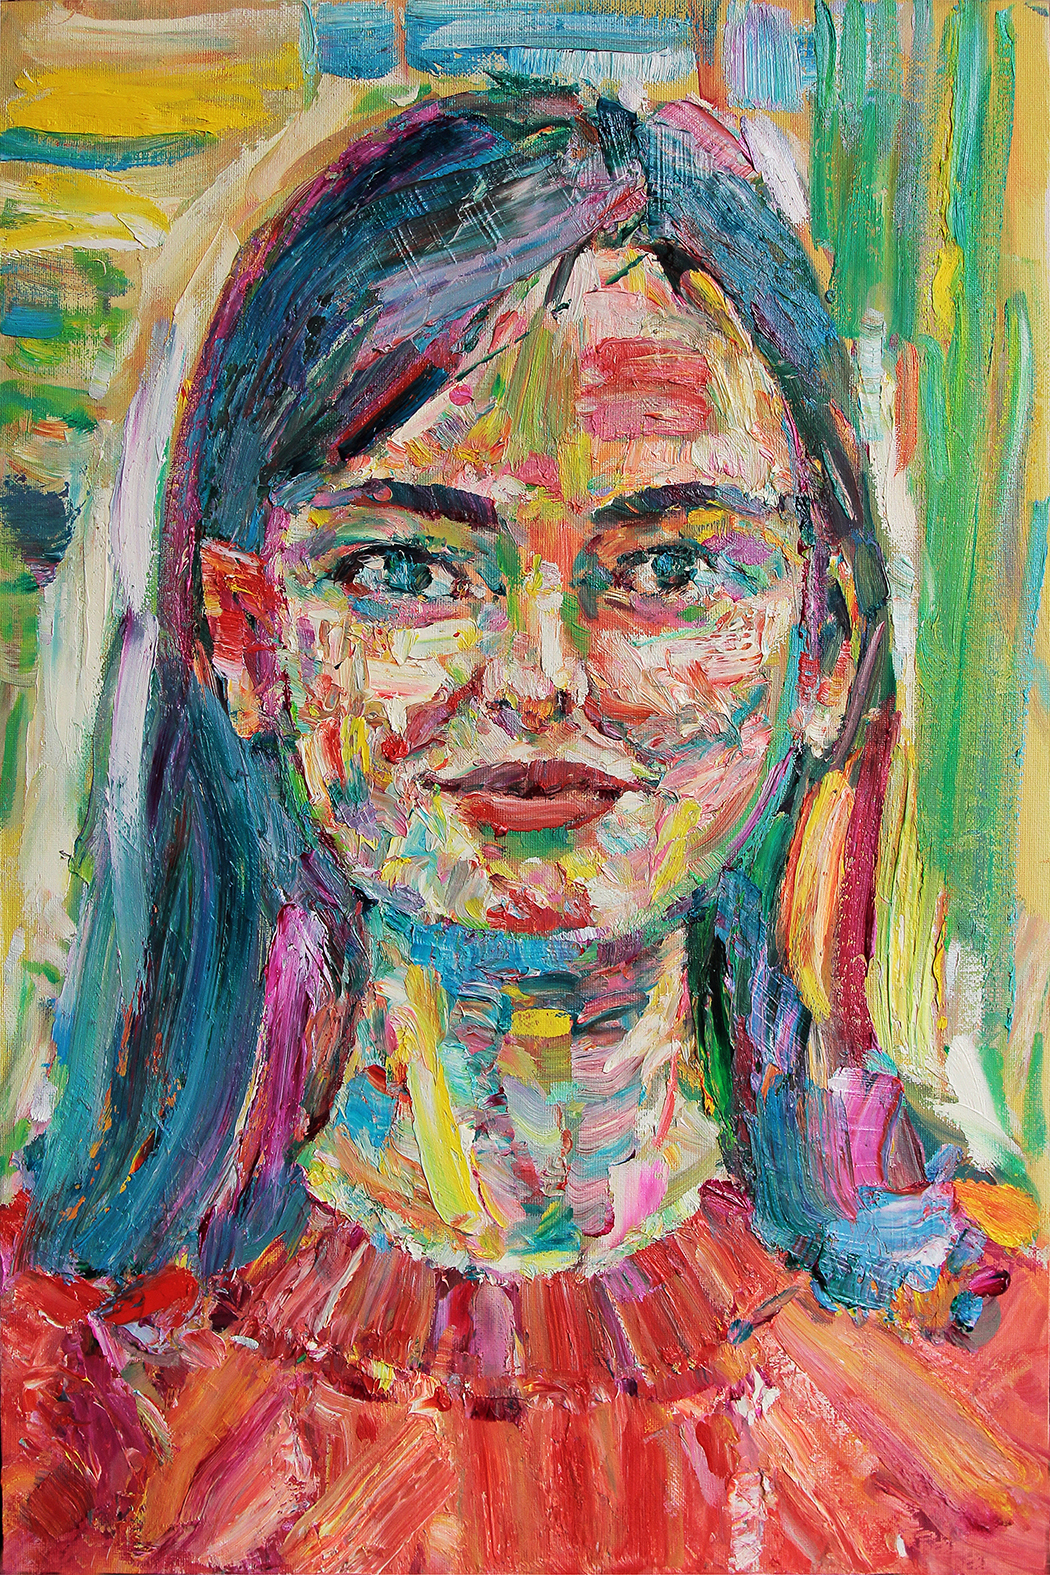 Mashenka. 2019. Oil on canvas. cardboard. 60 x 40